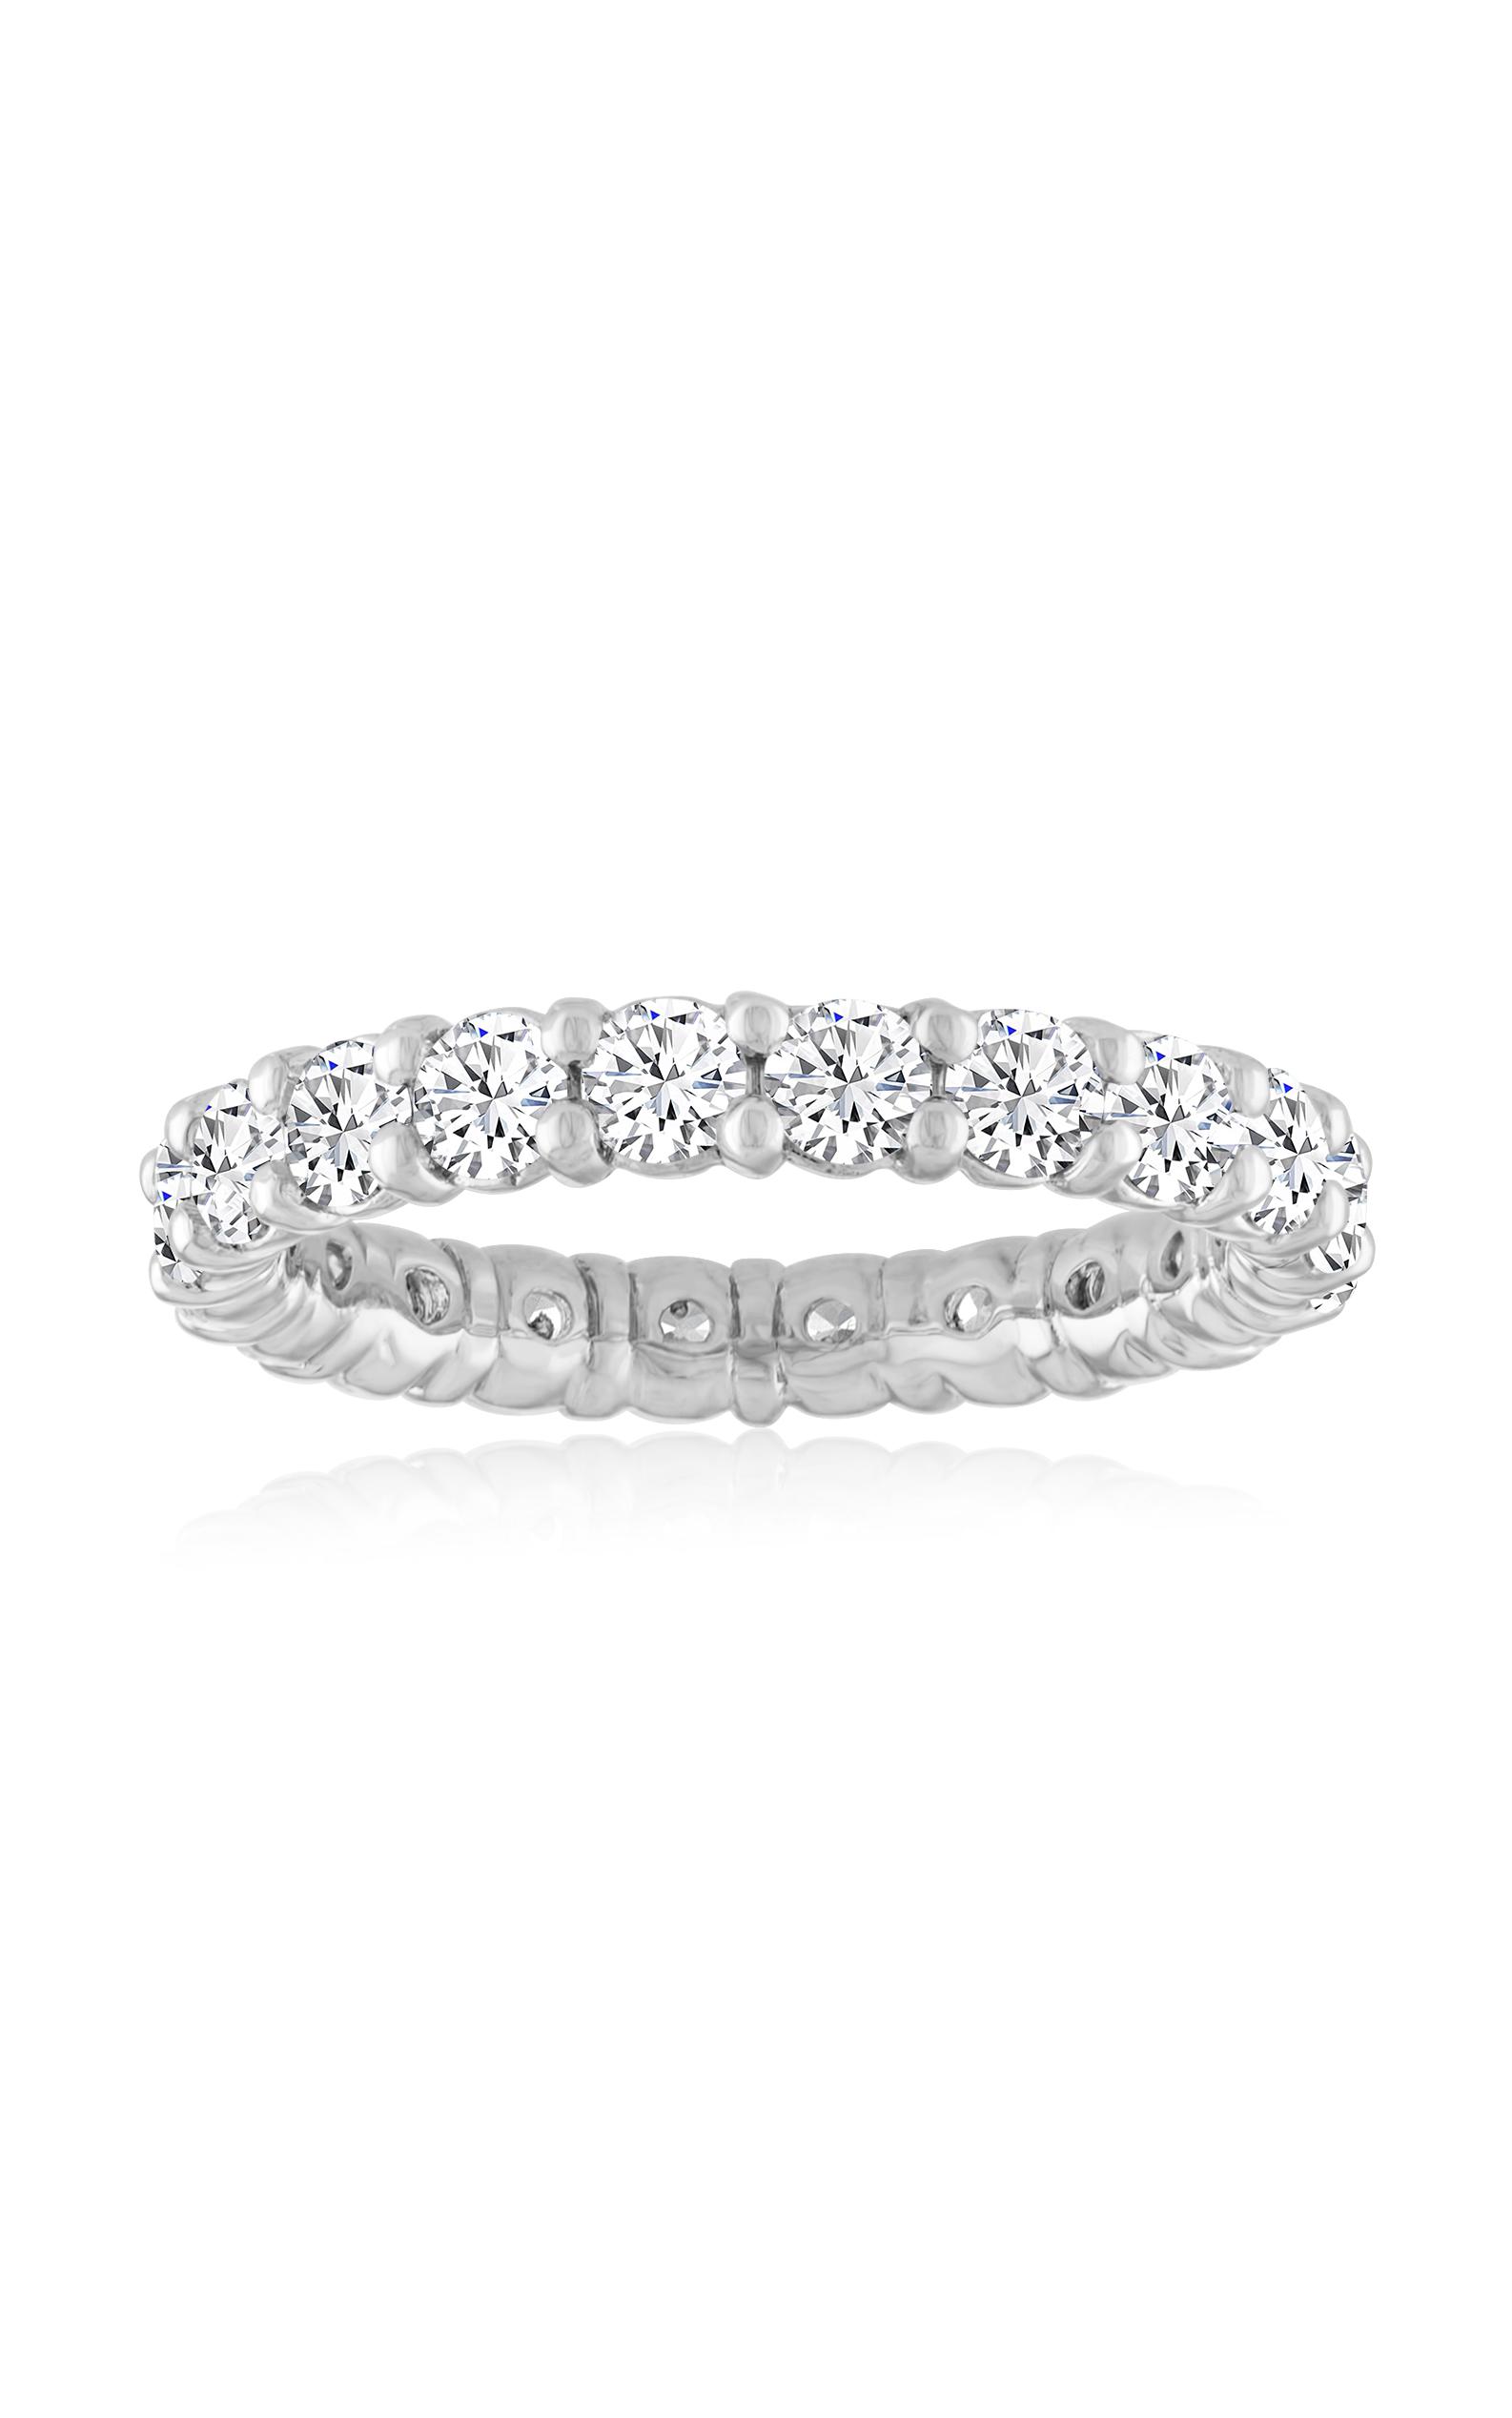 Imagine Bridal Wedding Bands 86076D-1.5 product image